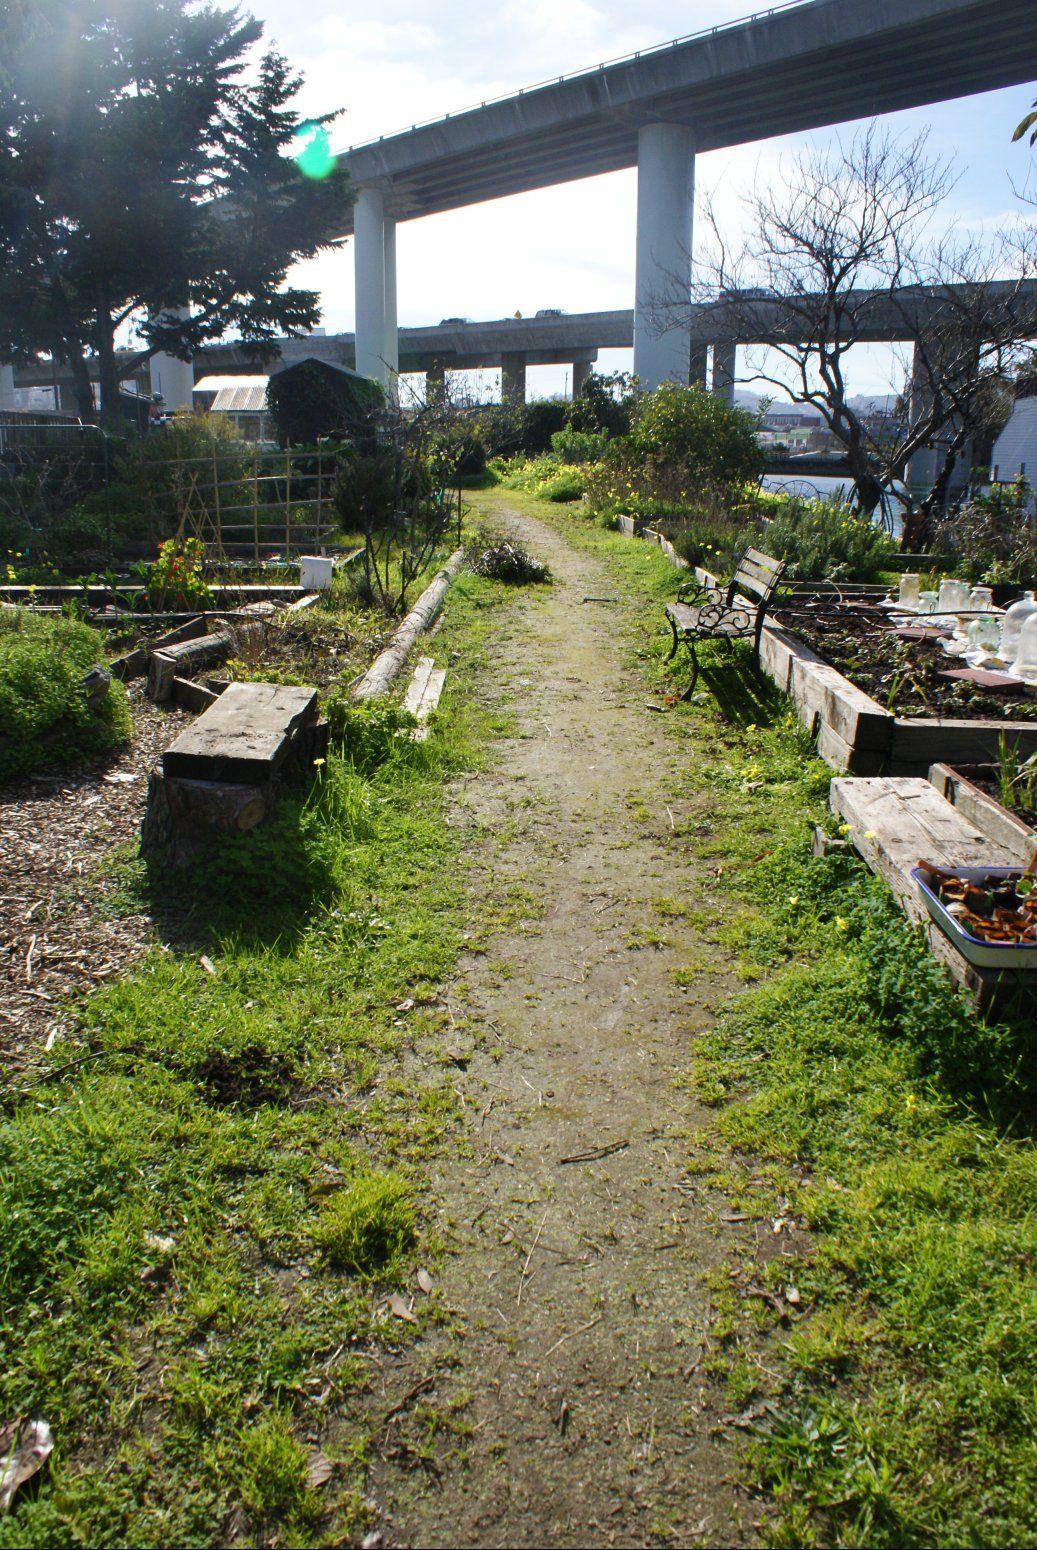 Mission Creek Community Garden In San Francisco